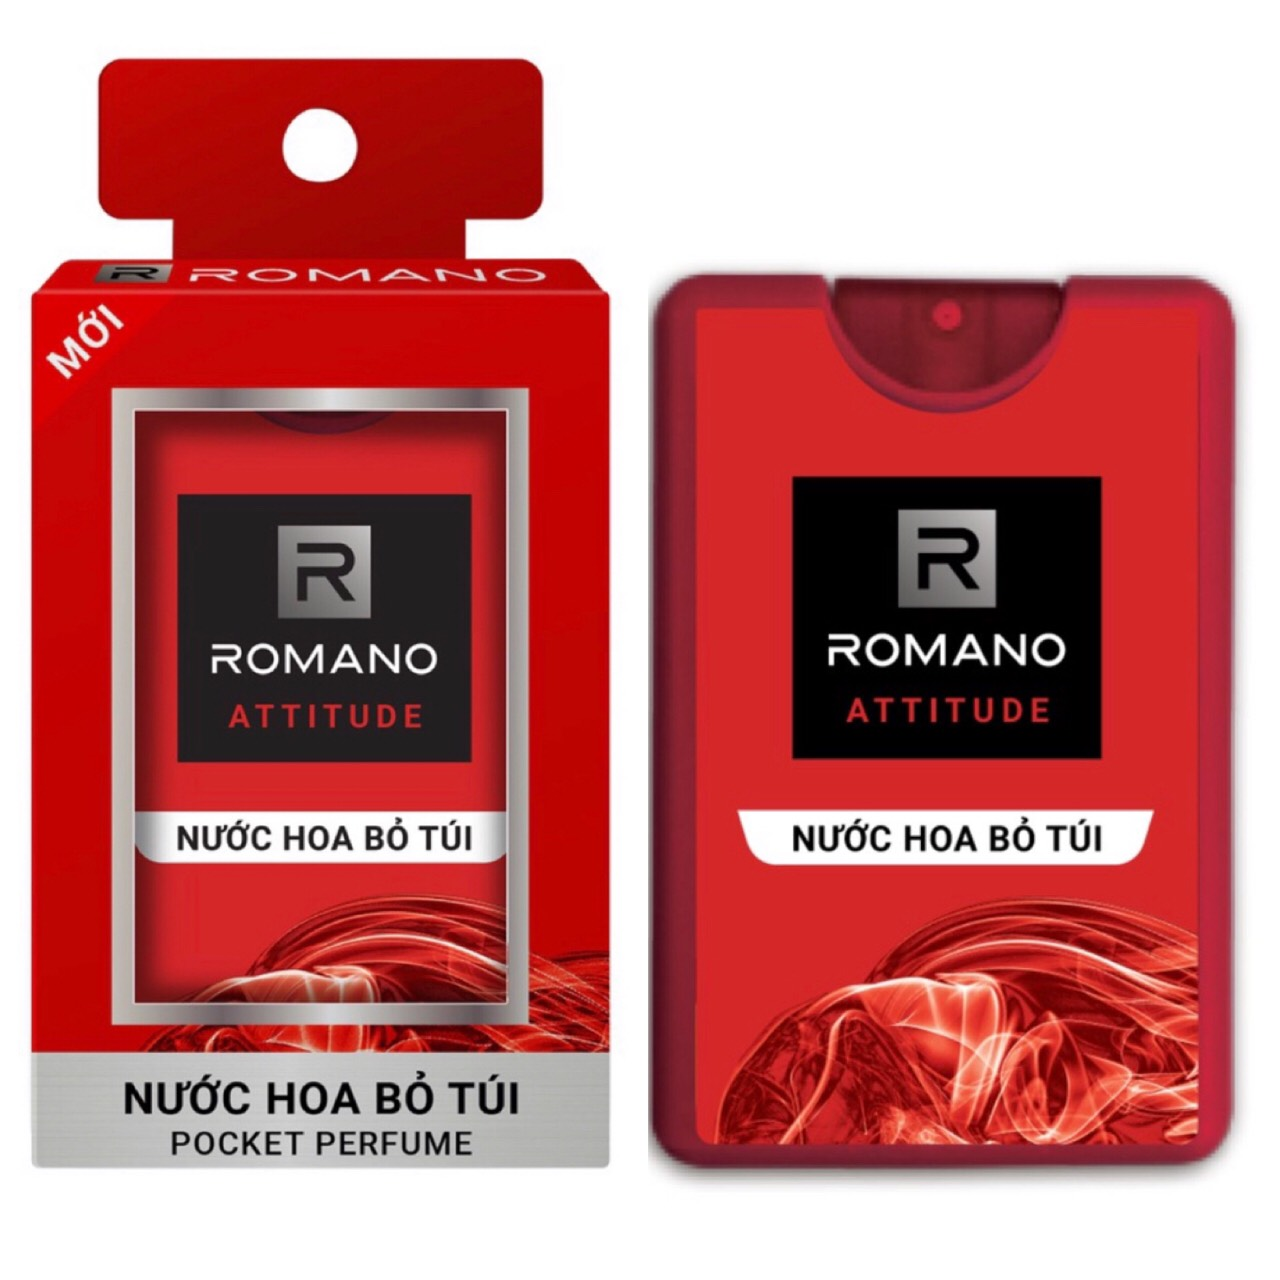 Combo Xịt khử mùi Romano Attitude 150ml+Nước hoa bỏ túi Romano Attitude 18ml